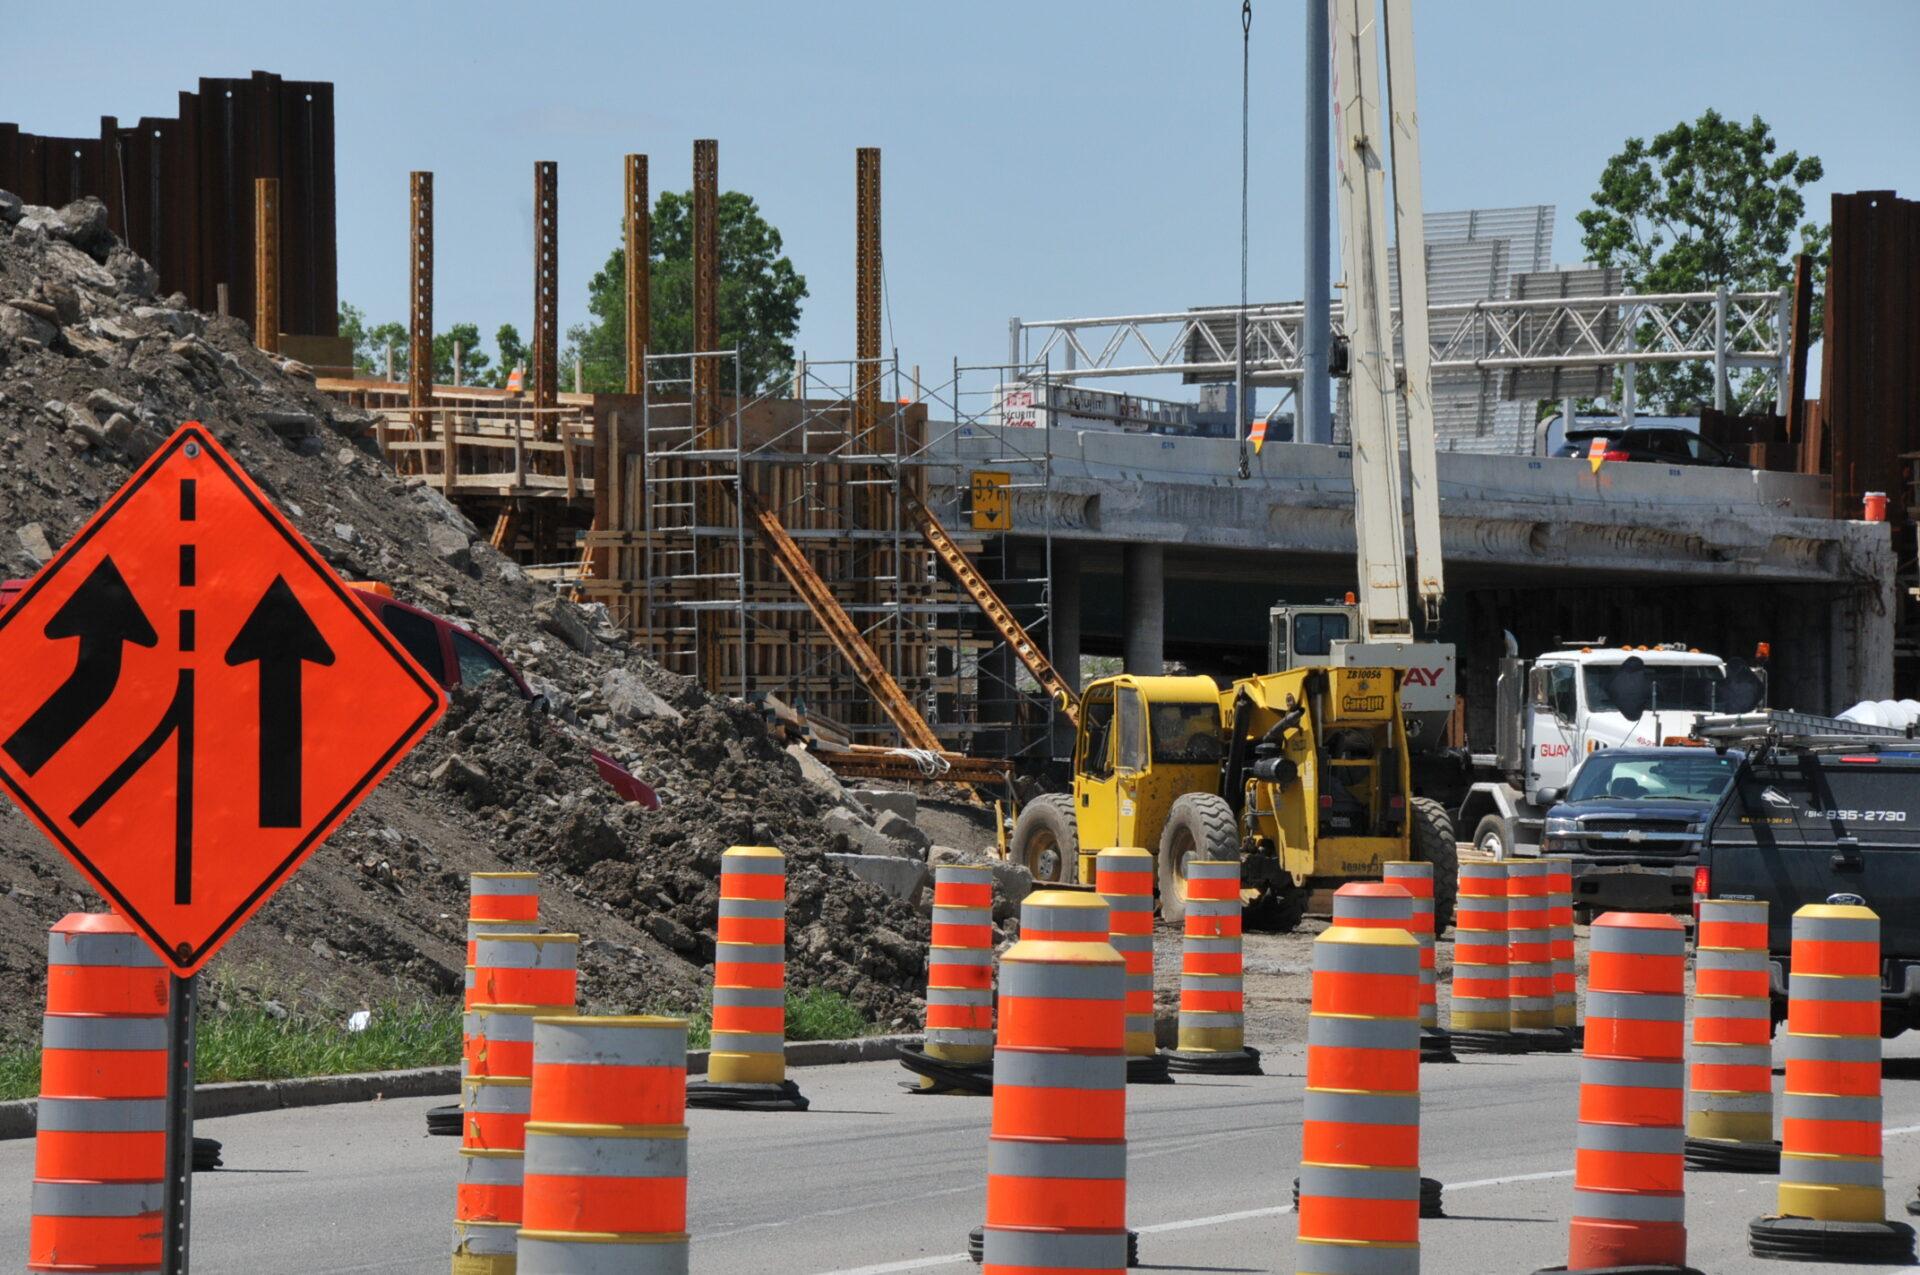 Summer 2020 major roadwork in the Montréal region